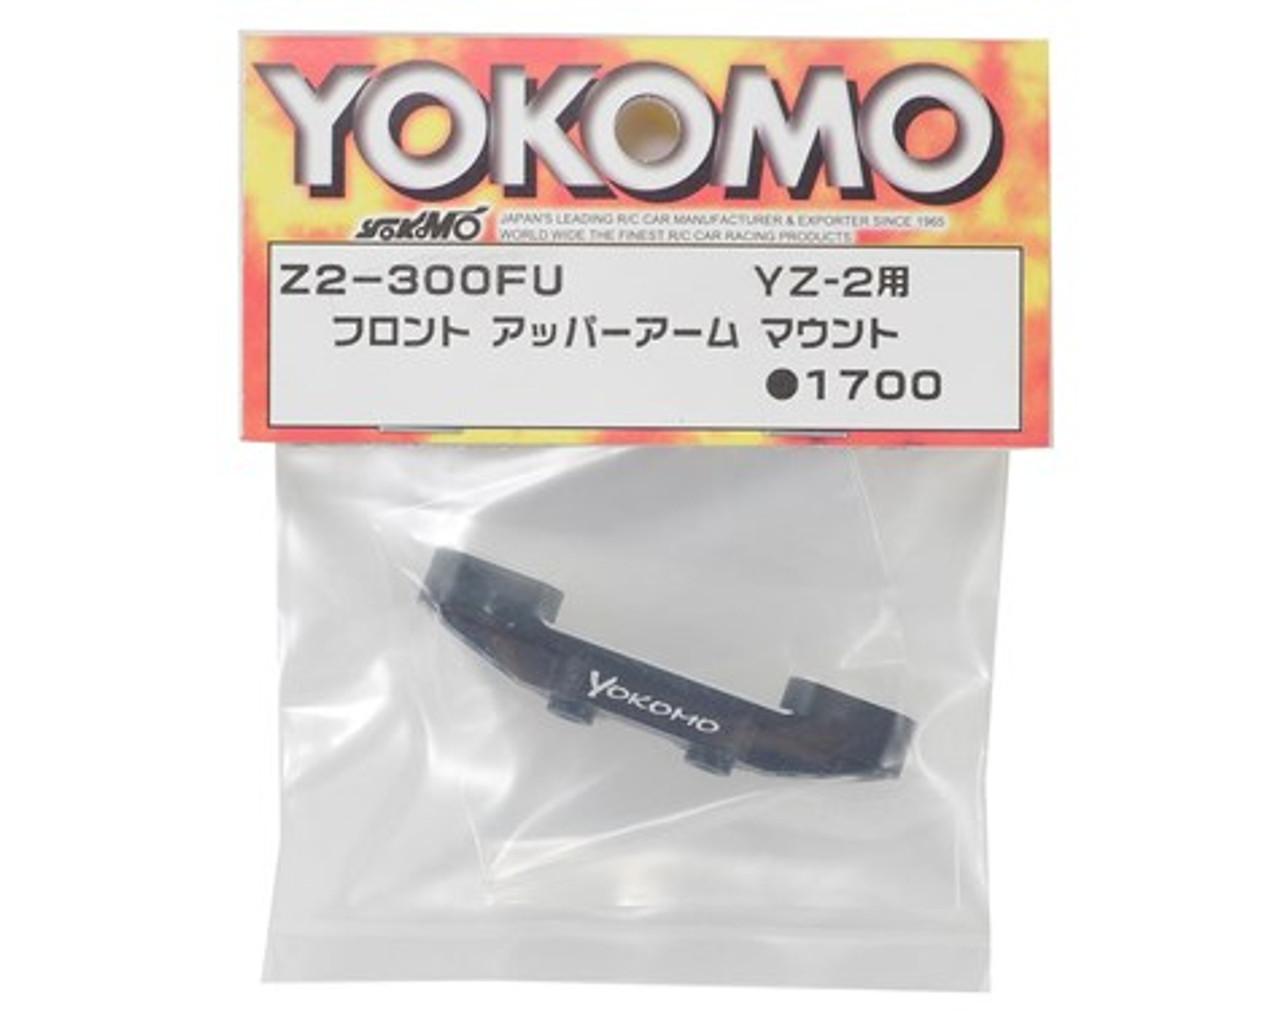 25° YOKZ2-300FLO Yokomo Aluminum Front Lower Suspension Mount